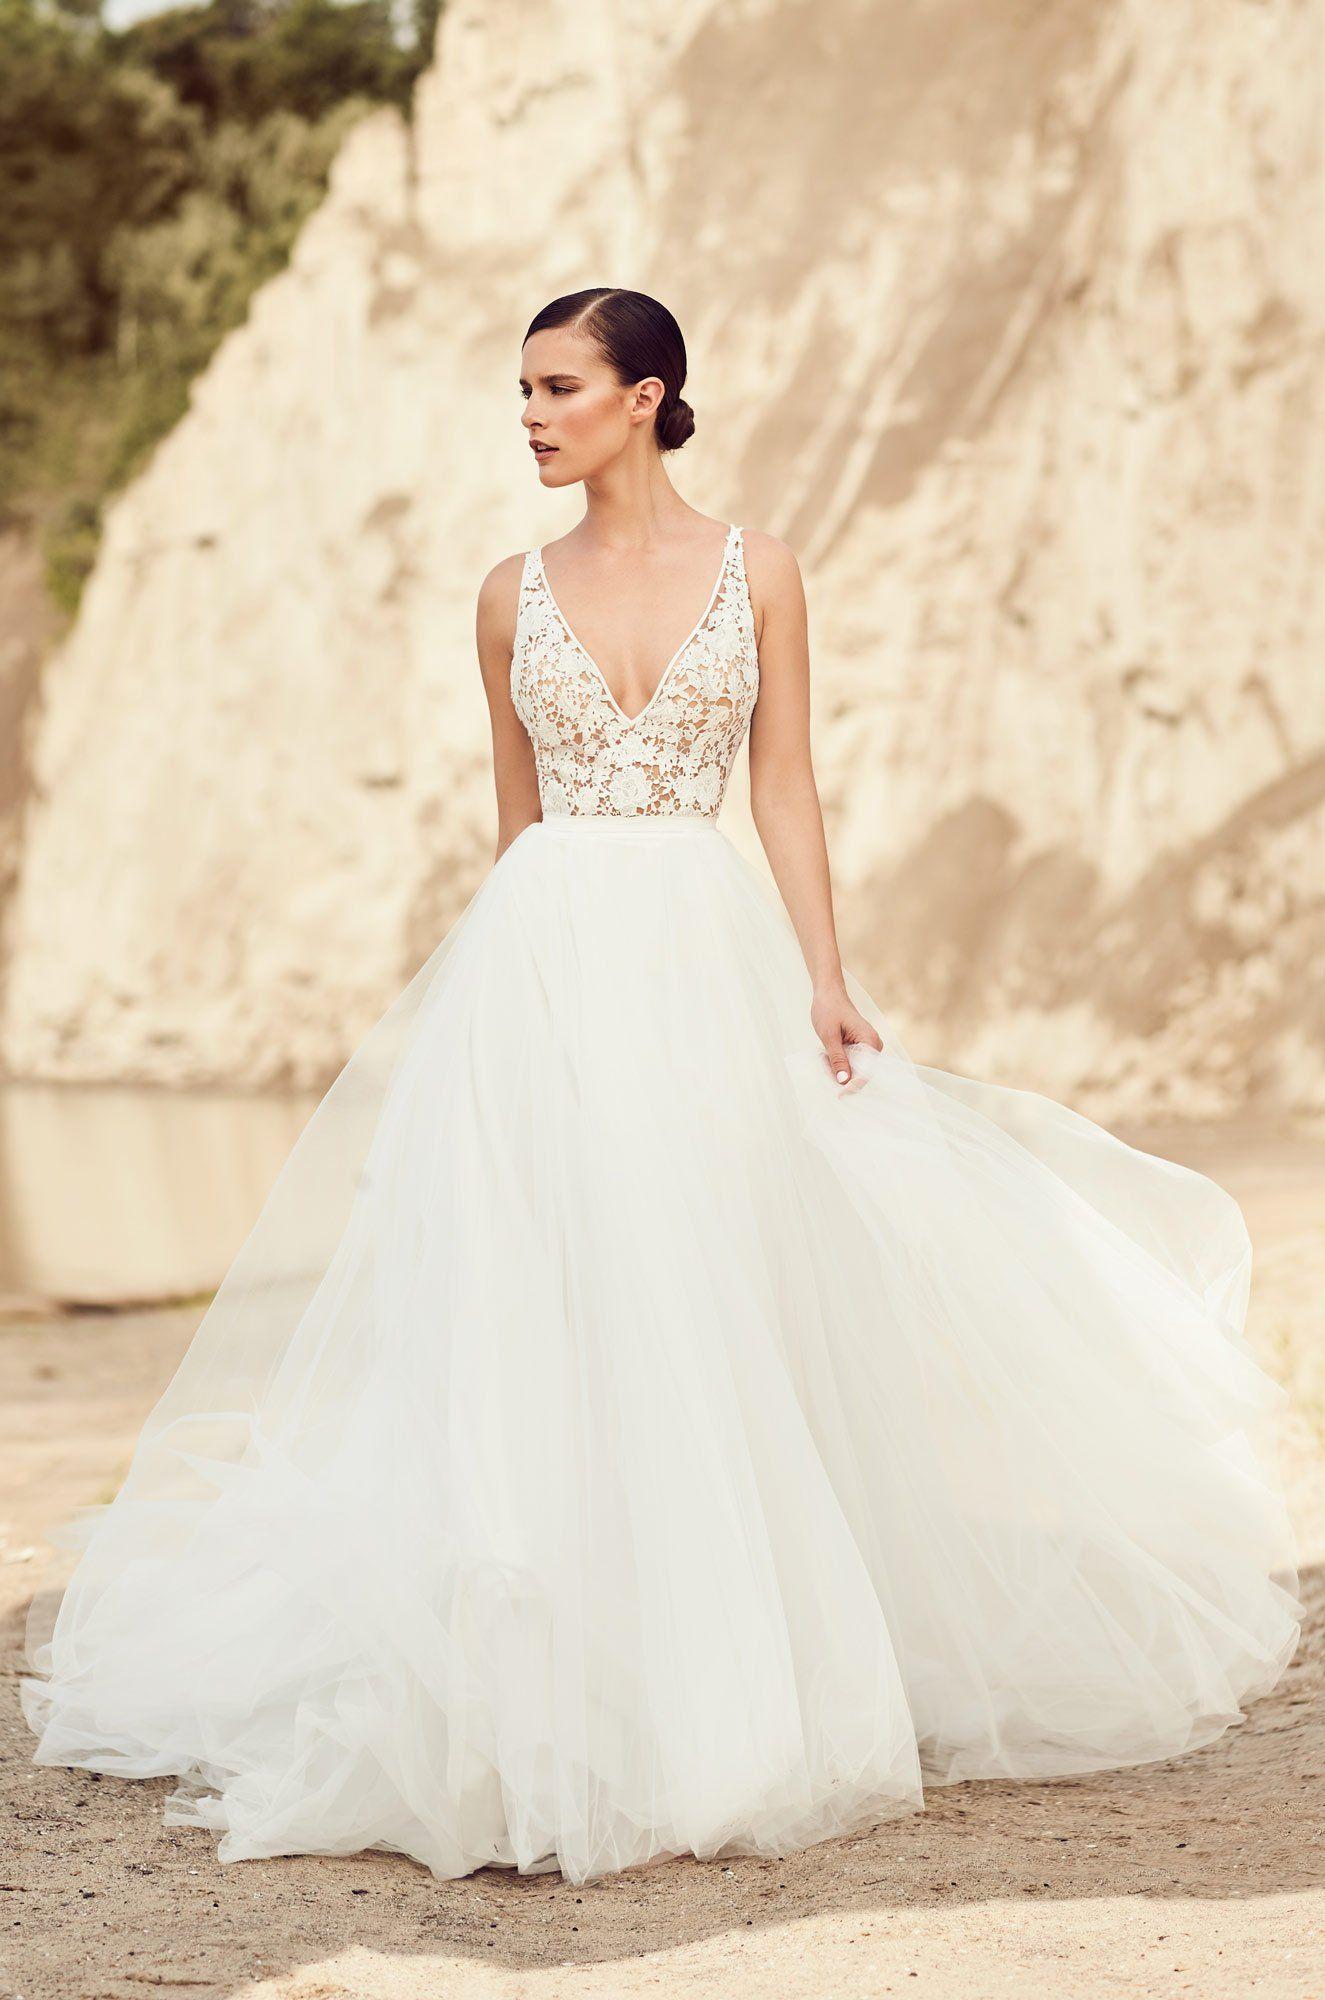 Lace v neck wedding dress  Mikaella   Wedding Ideas  Pinterest  Tulle skirts Bridal